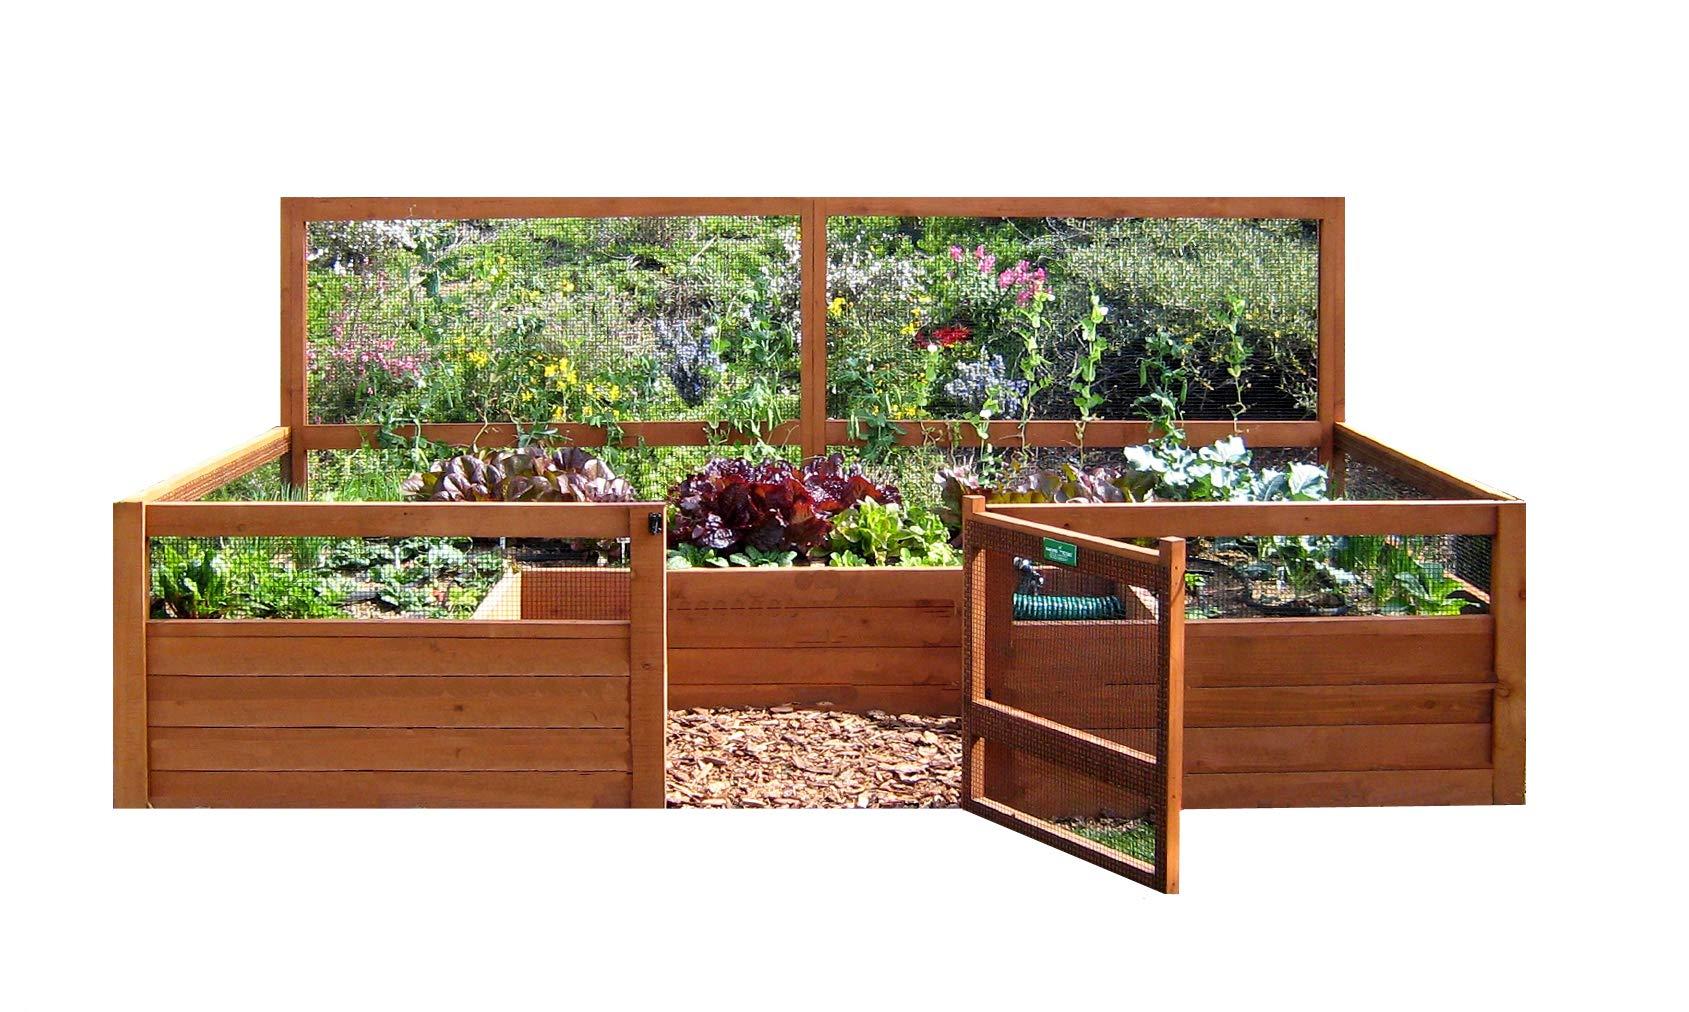 Just Add Lumber Vegetable Garden Kit - 6'x12' Deluxe